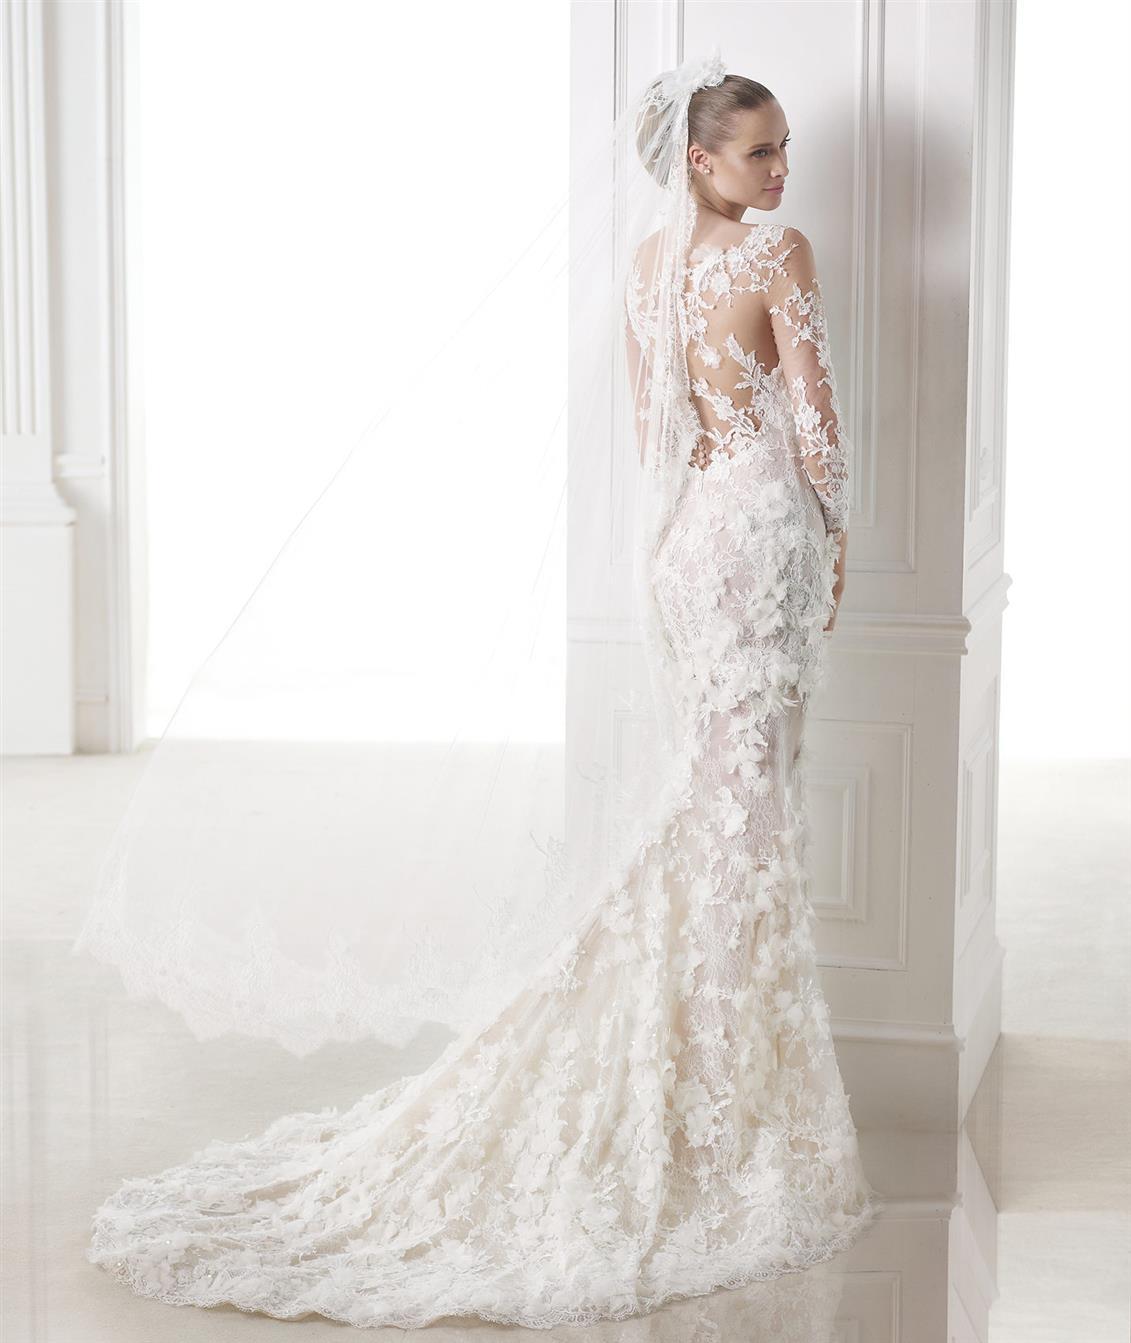 Long Sleeve Wedding Dress Capricornio from Pronovias